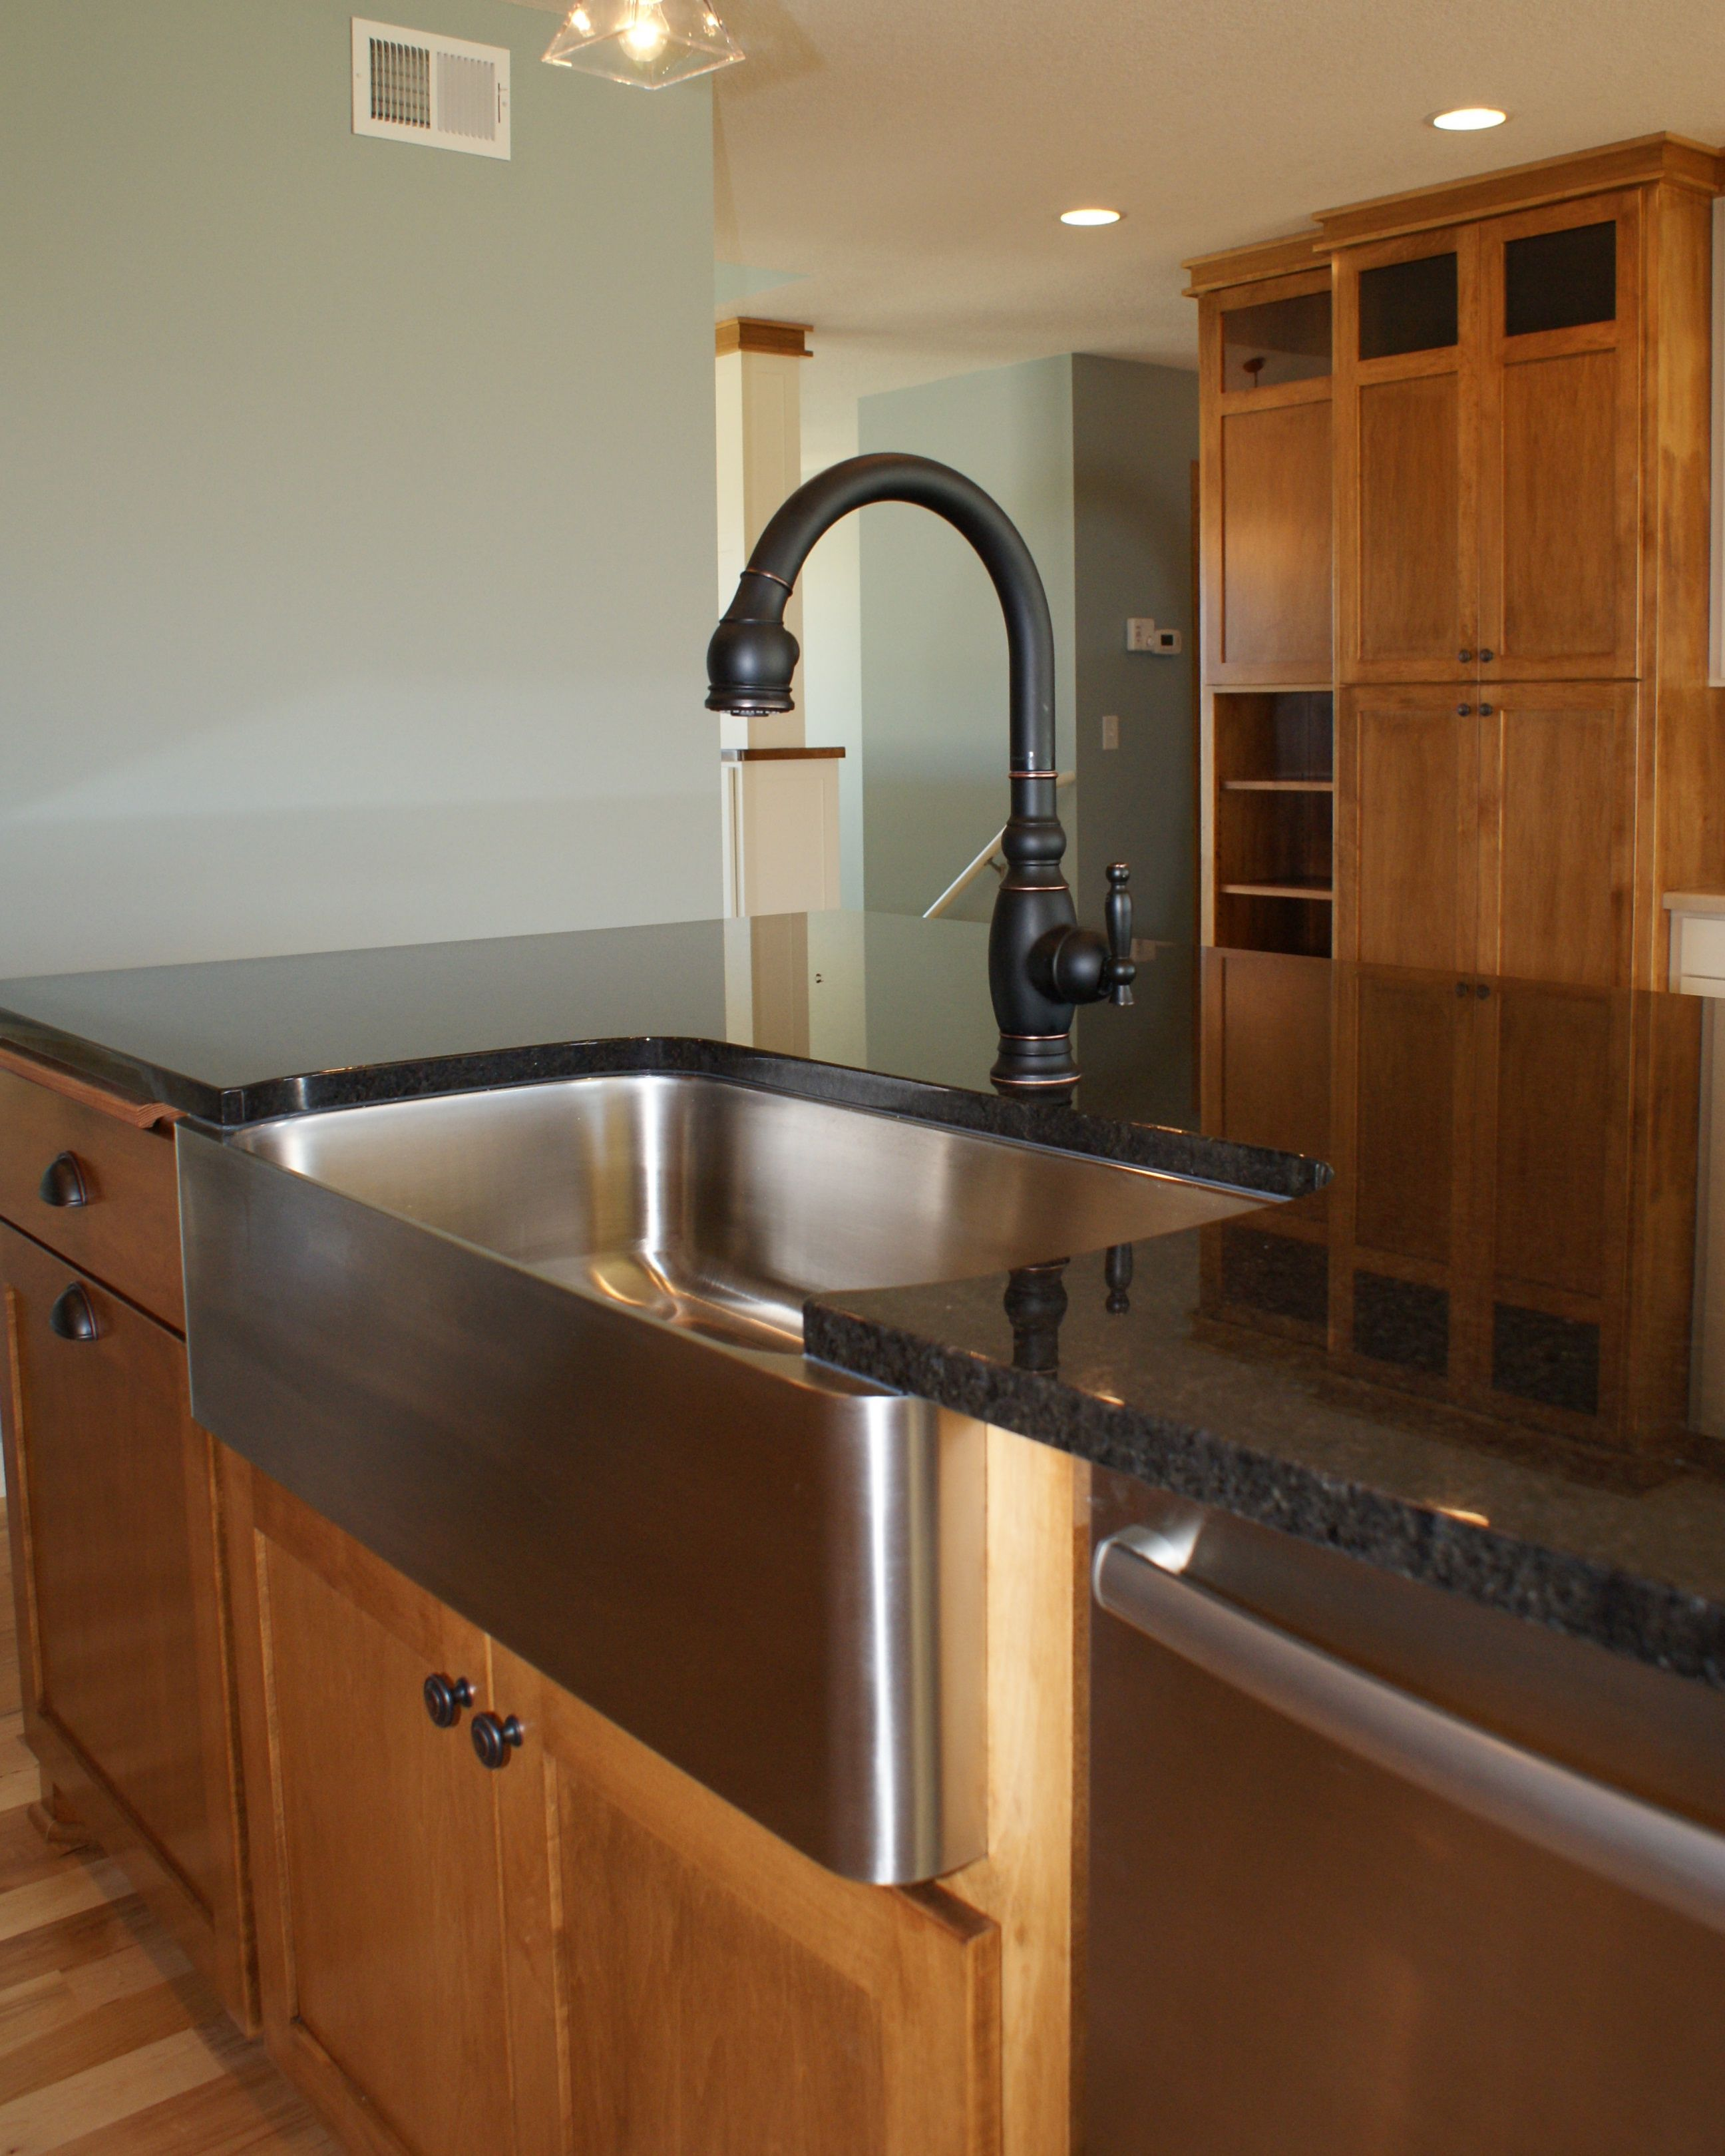 Kitchen Farmhouse Sinks Chromcraft Chairs Dark Granite On Island With Stainless Steel Farm Sink And